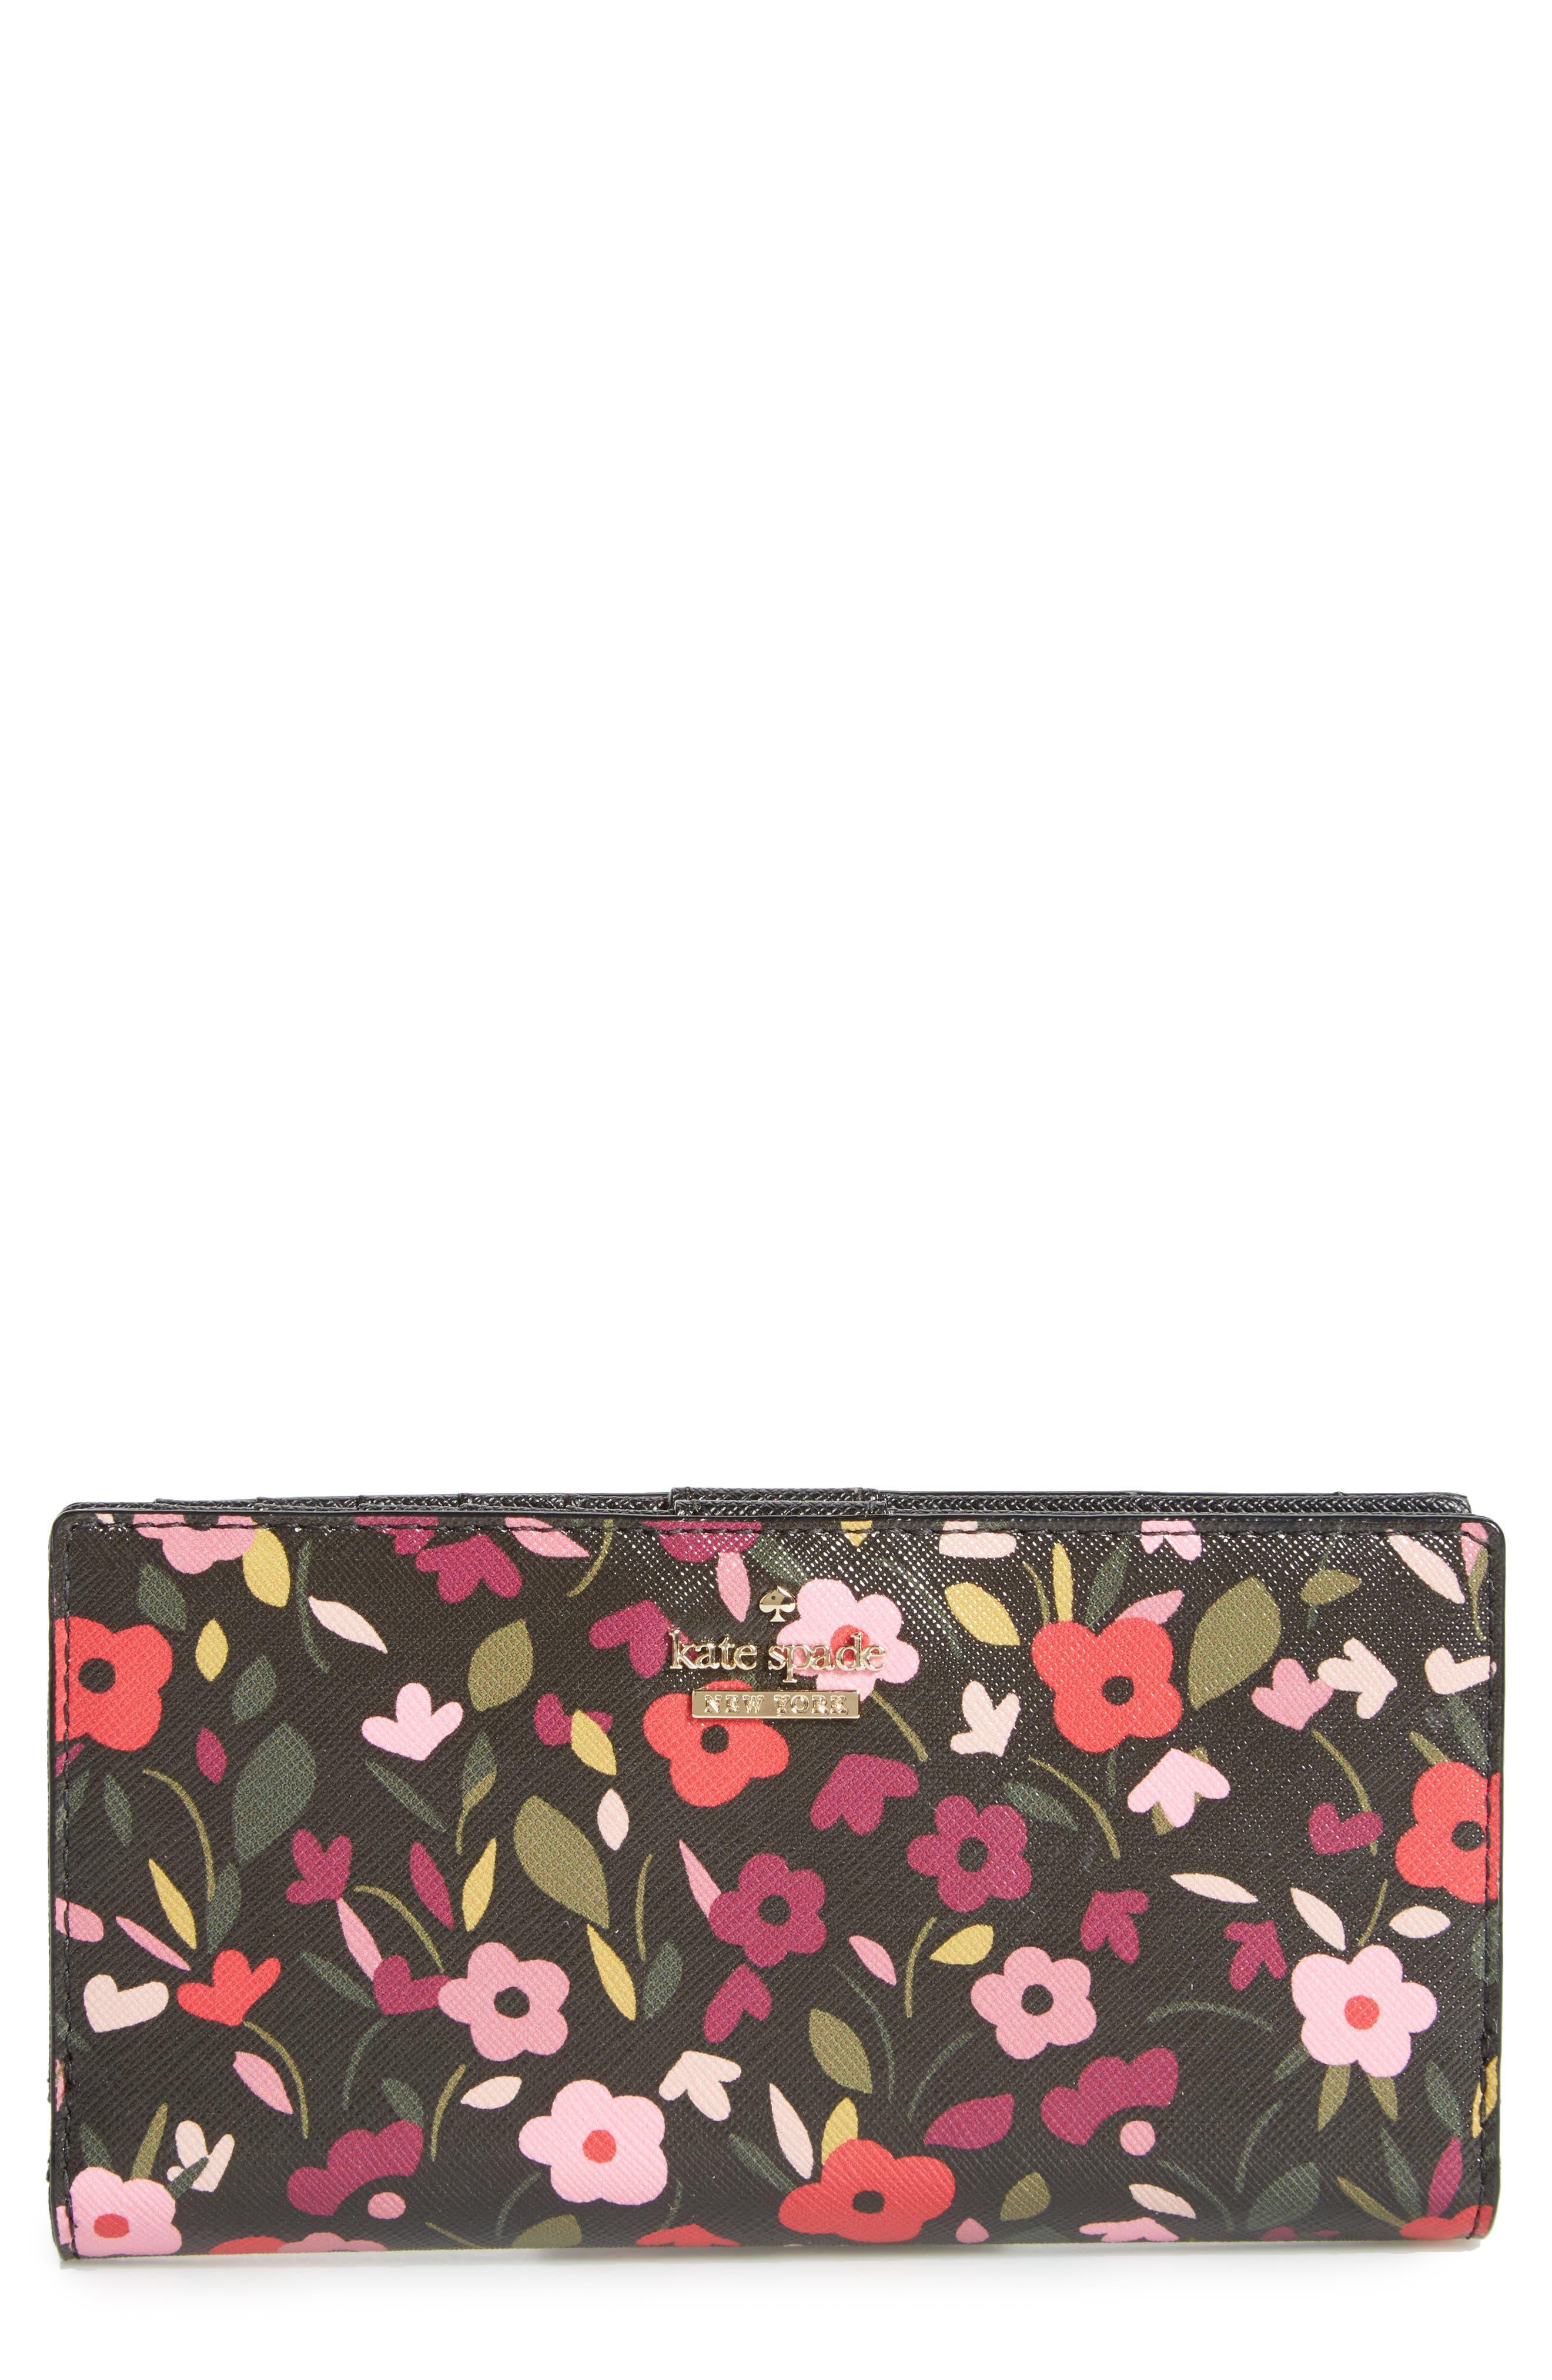 kate spade new york cameron street - stacy boho floral wallet